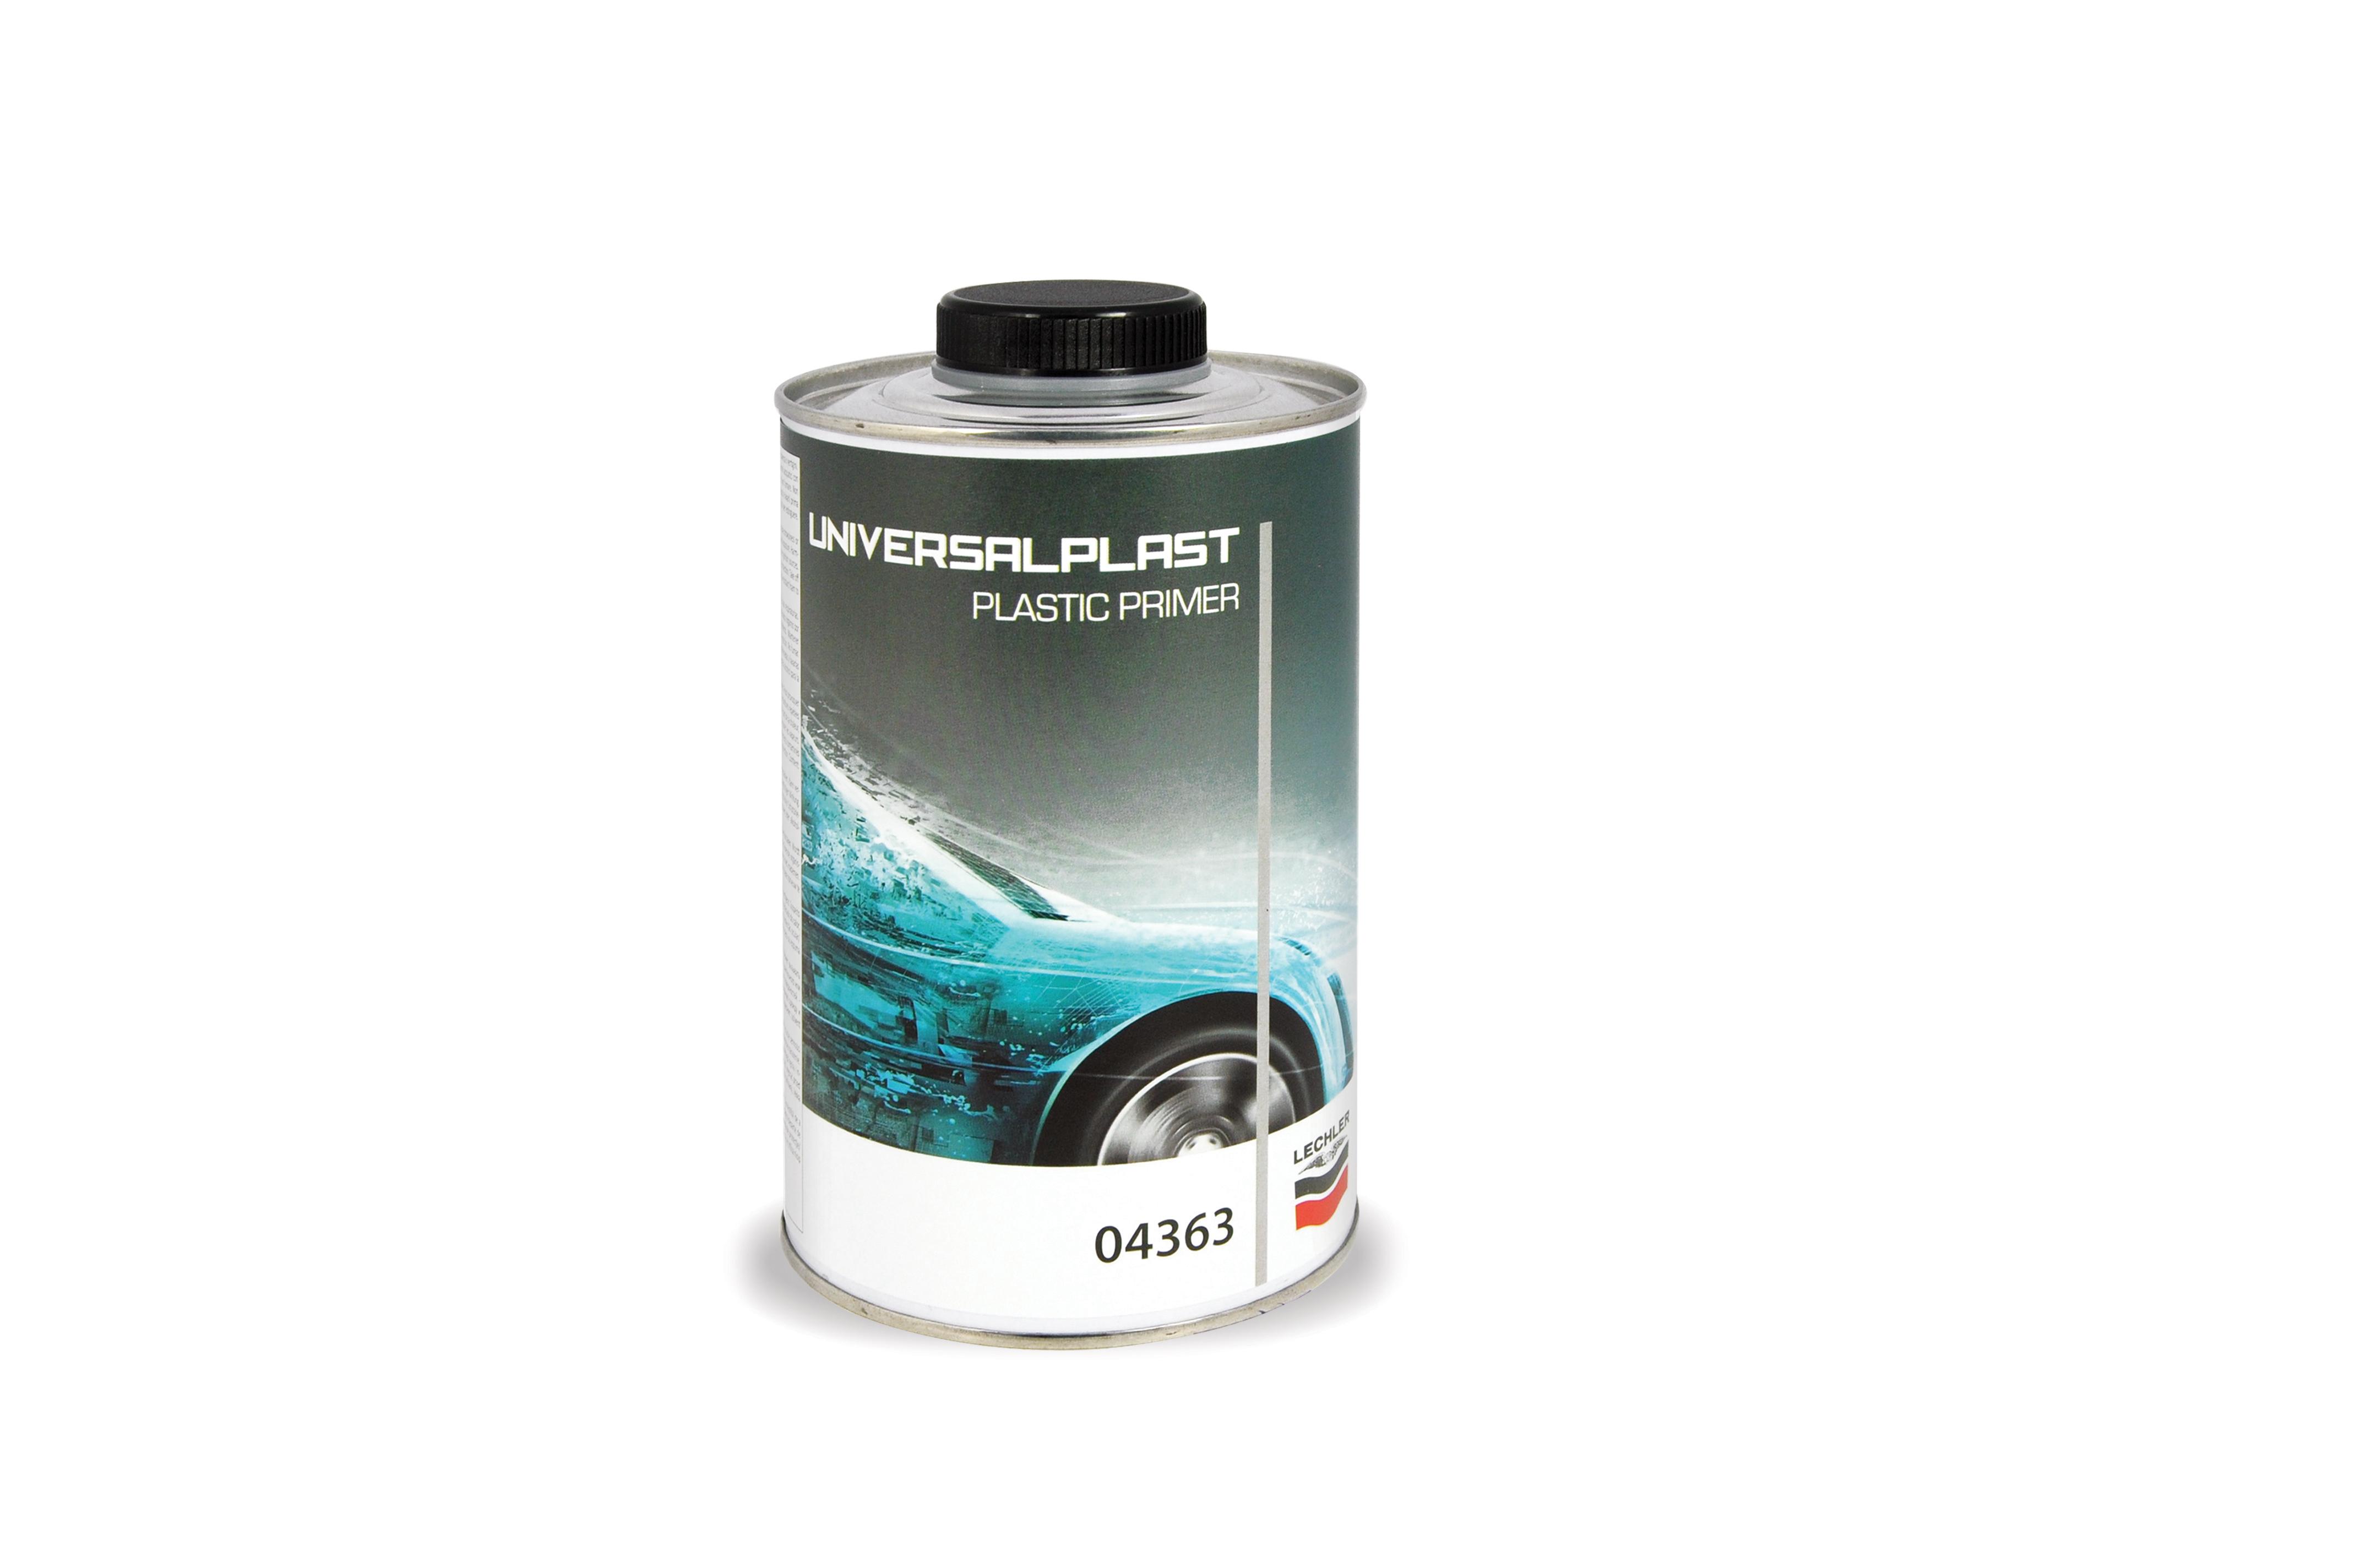 04363 Universal Plast 2:1